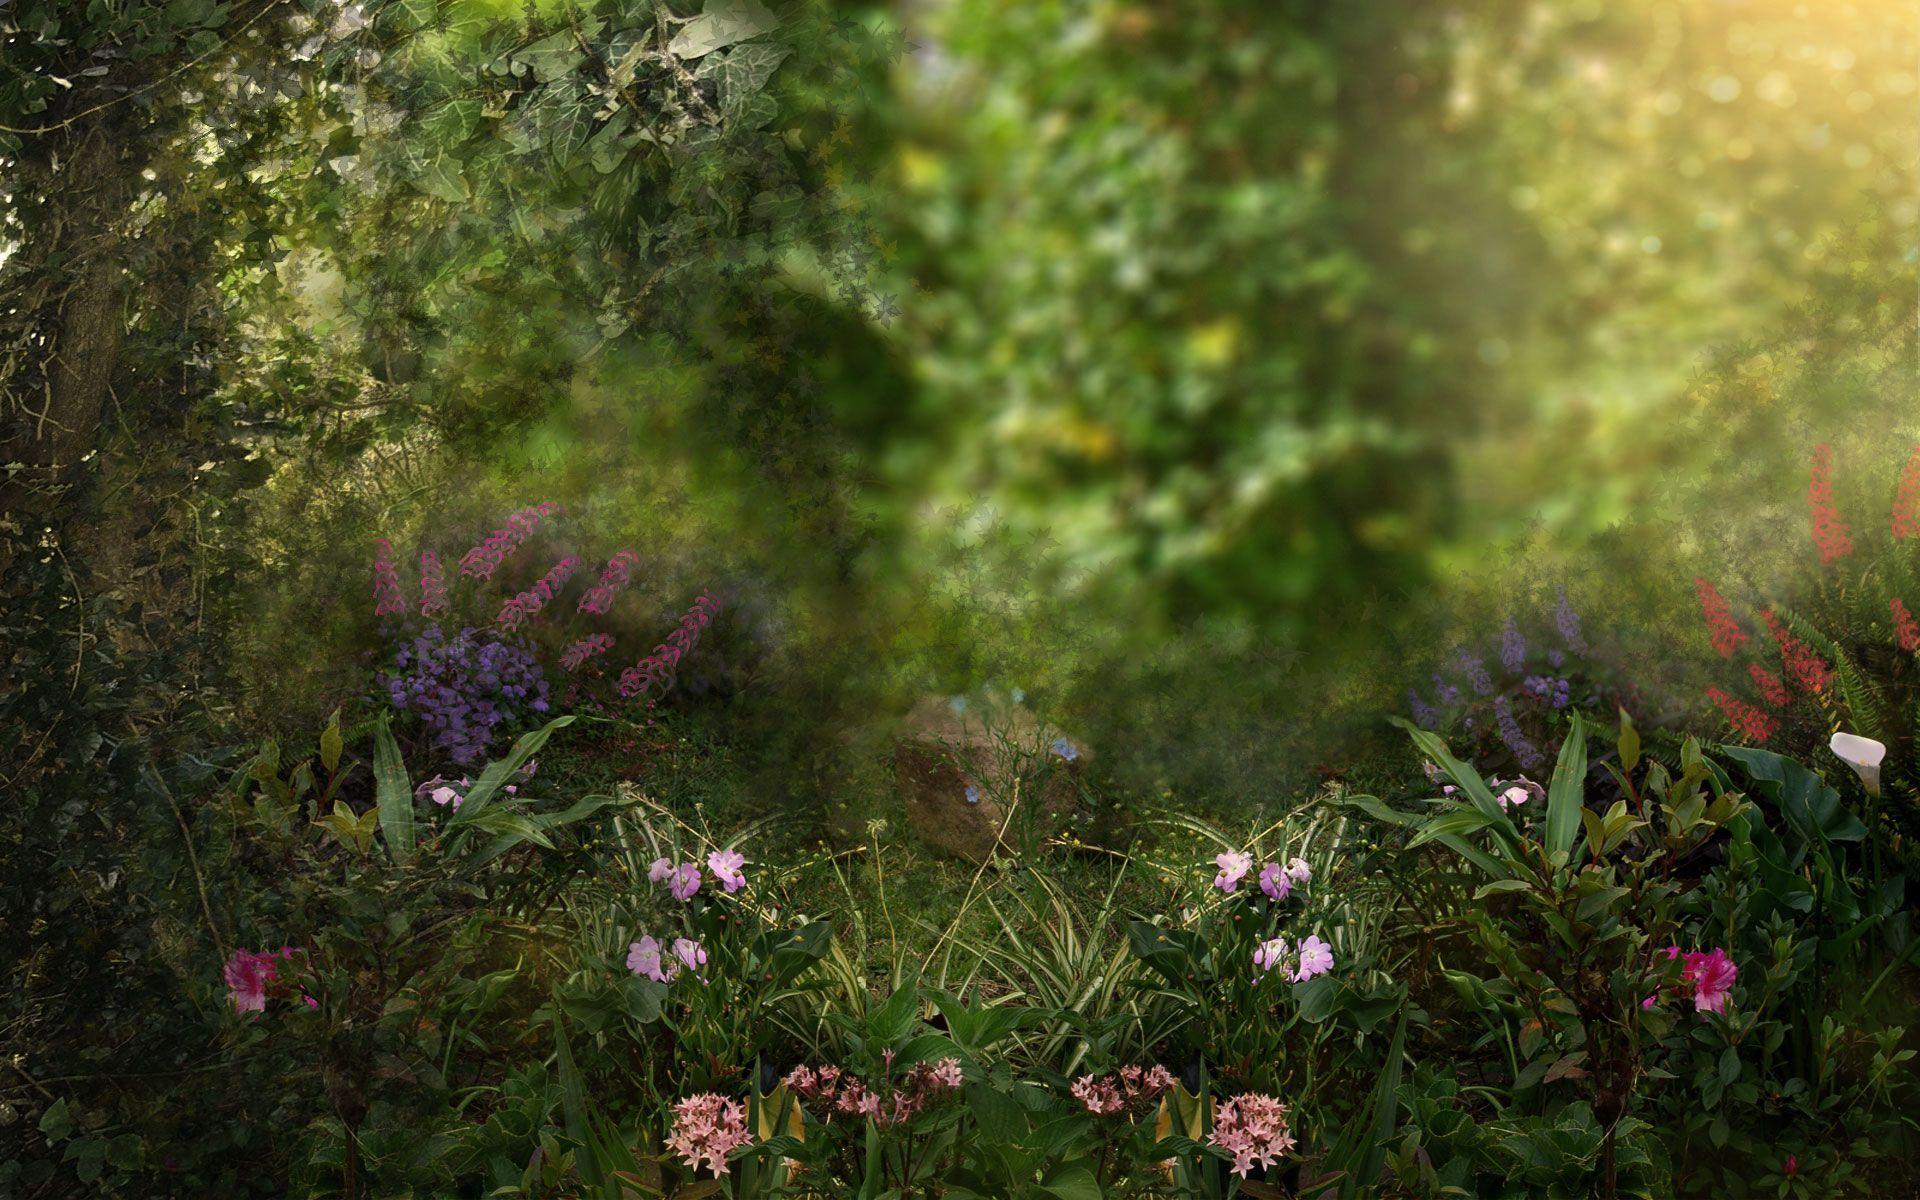 Fantasy Garden Art Flowers Garden Trees Flower Garden Cat Flowers Wallpaper Backgrounds